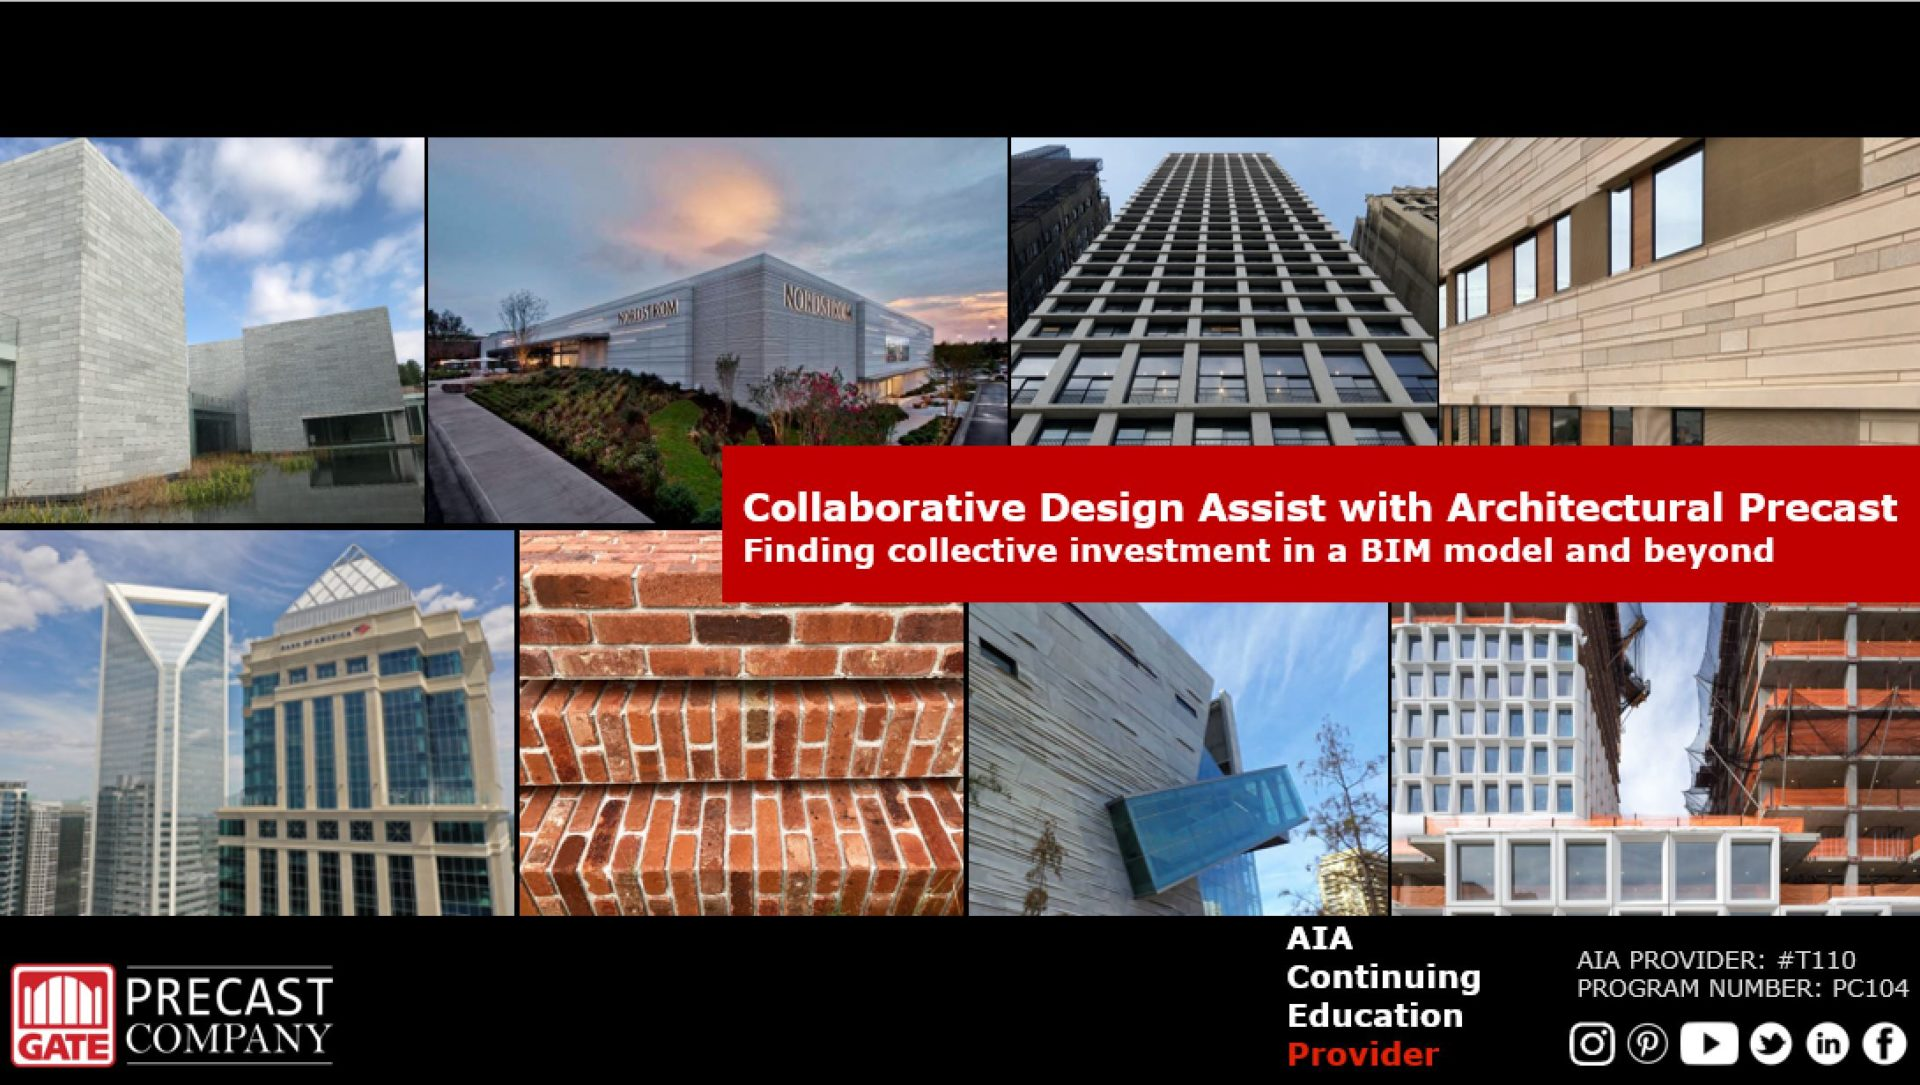 pc104 Collaborative Design Assist with Architectural Precast – Case Studies